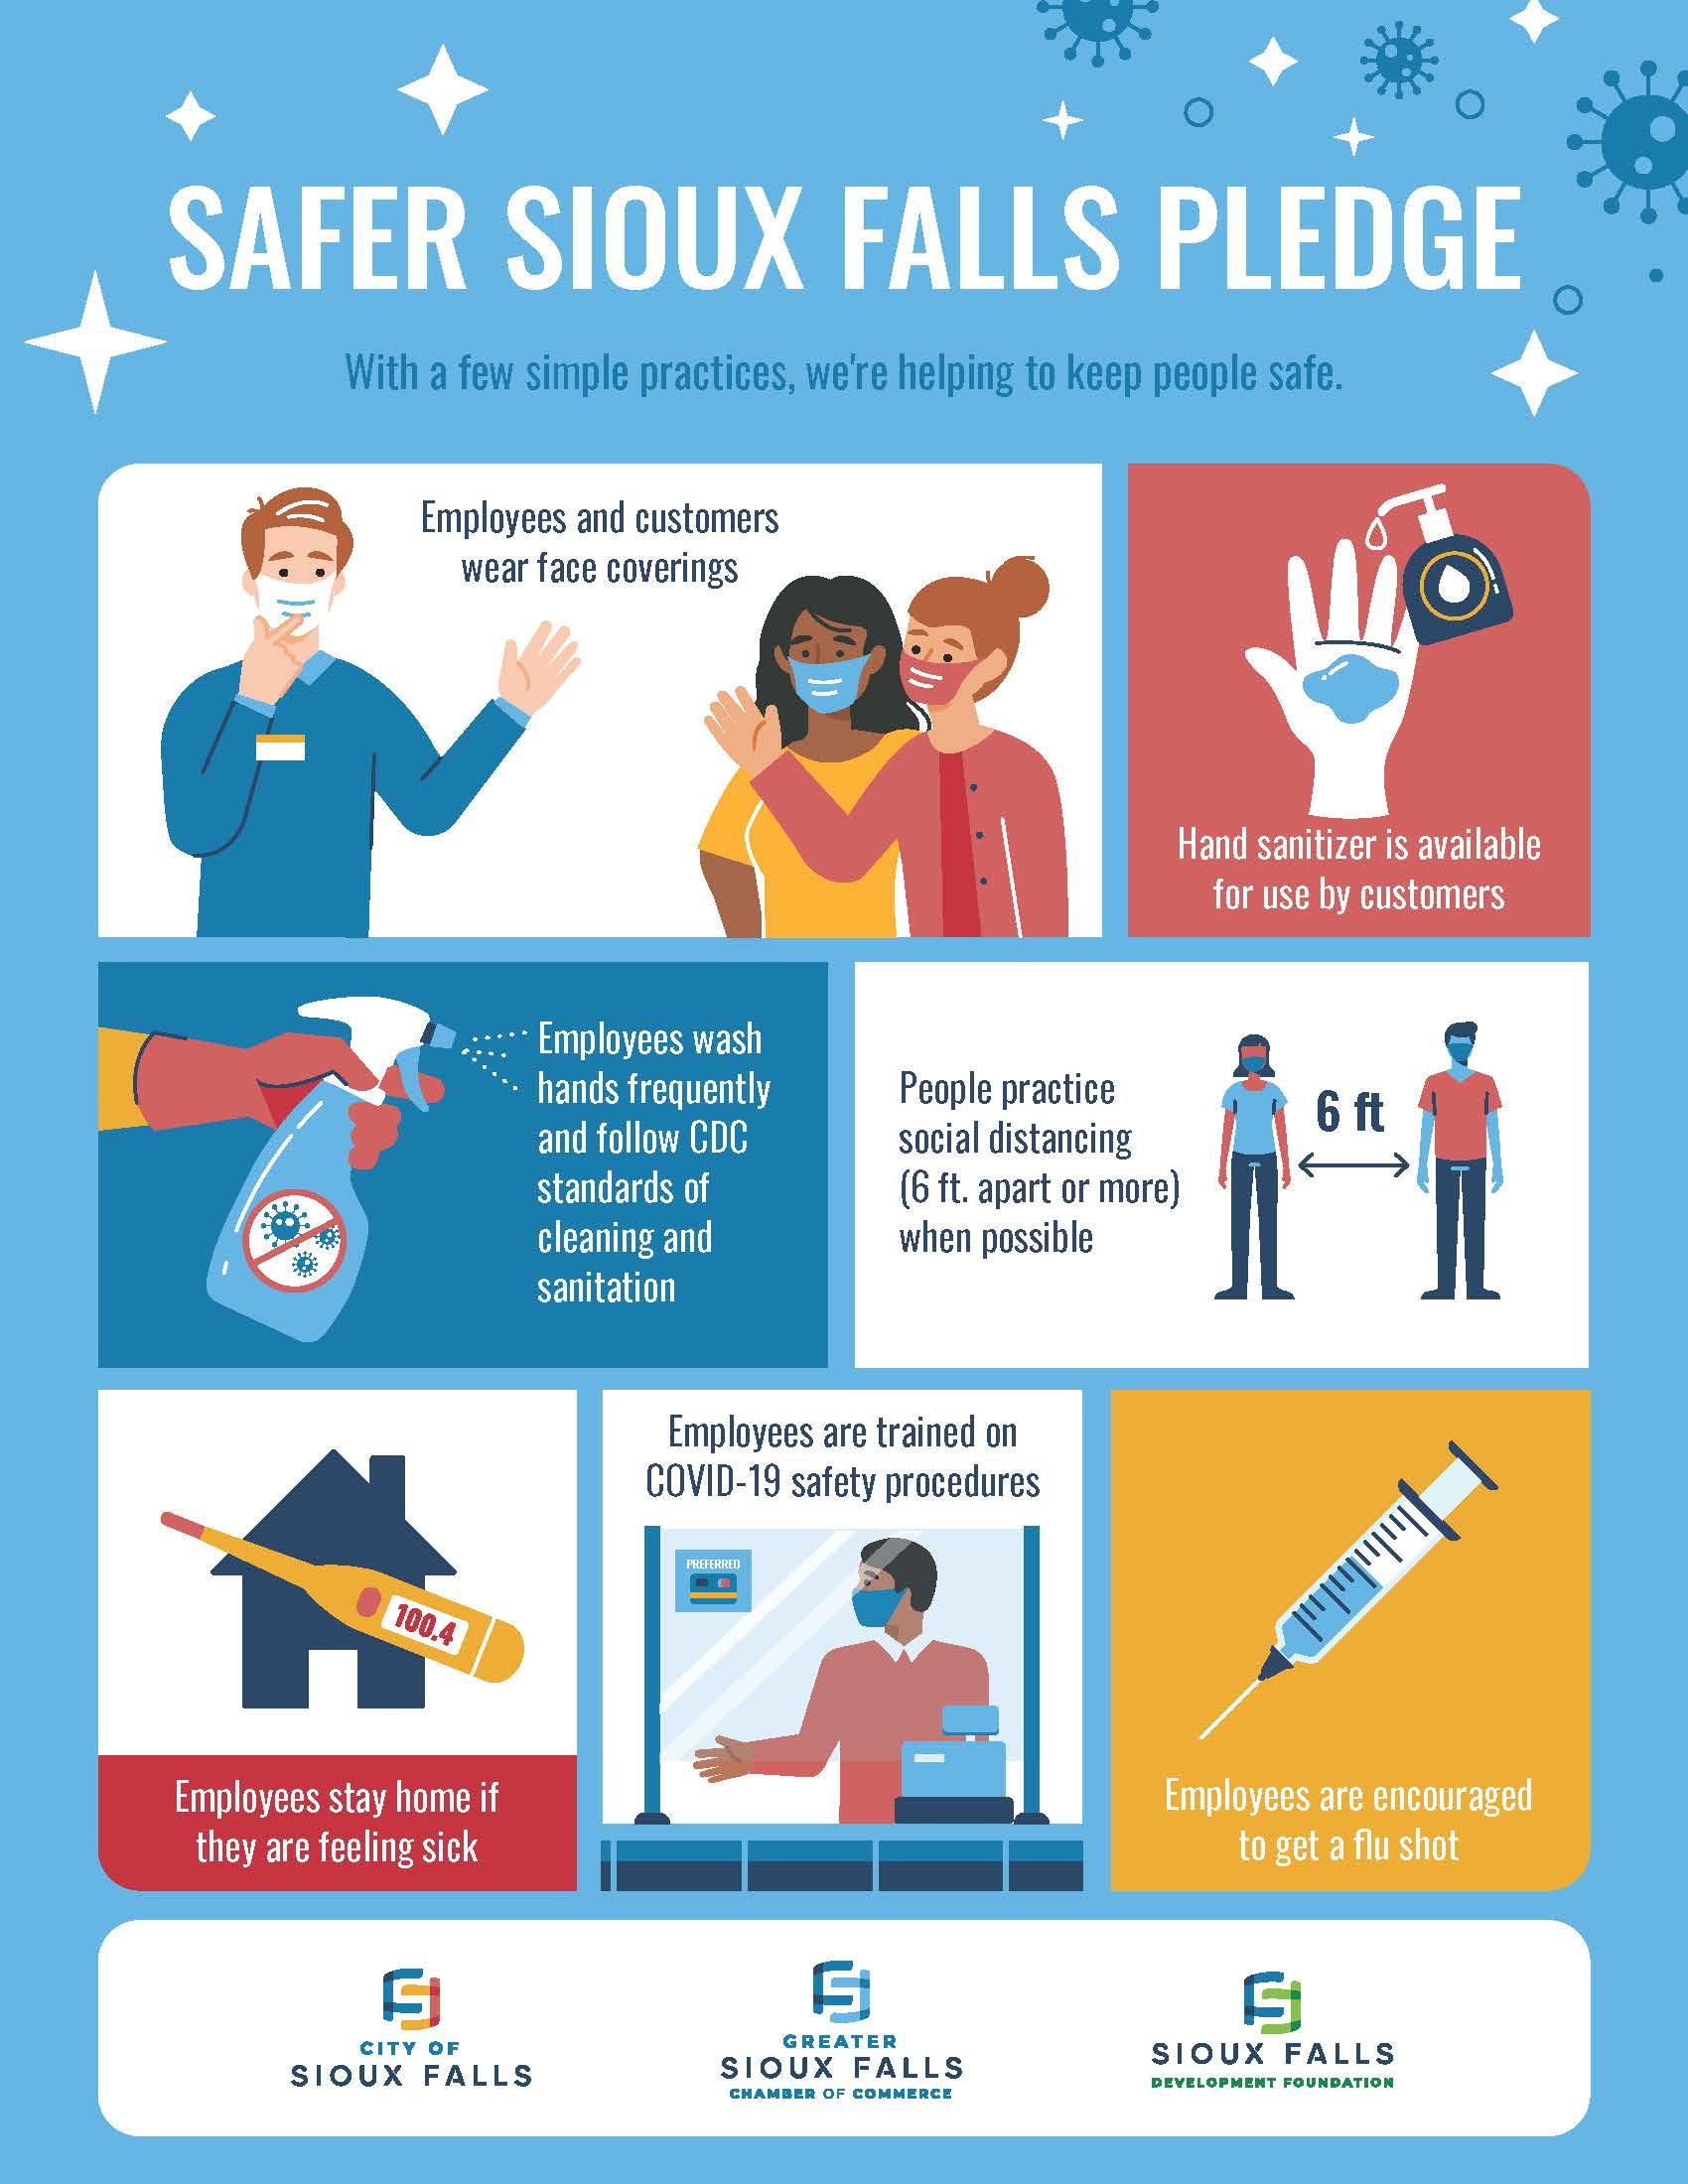 Safer Sioux Falls Pledge